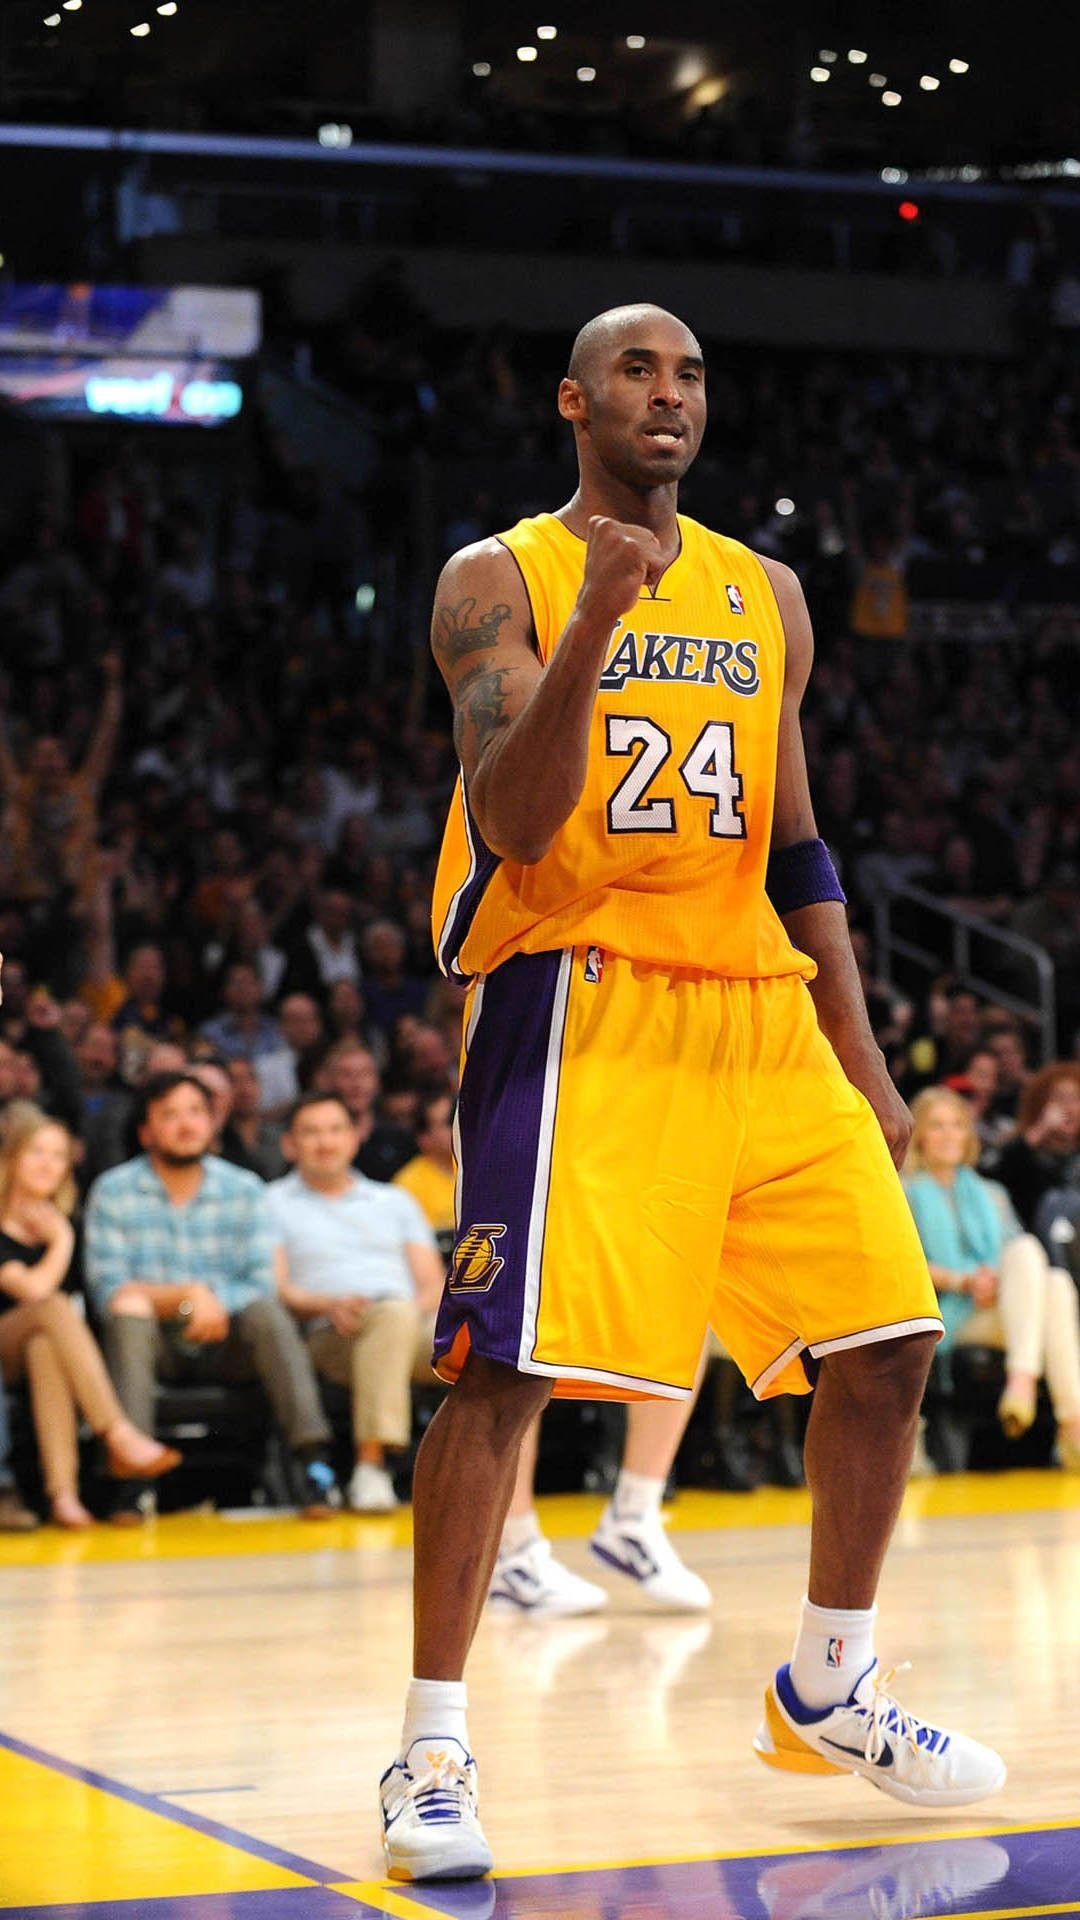 Dunk Kobe Bryant Wallpaper Download Kobe Bryant Wallpaper Kobe Bryant Dunk Kobe Bryant Iphone Wallpaper